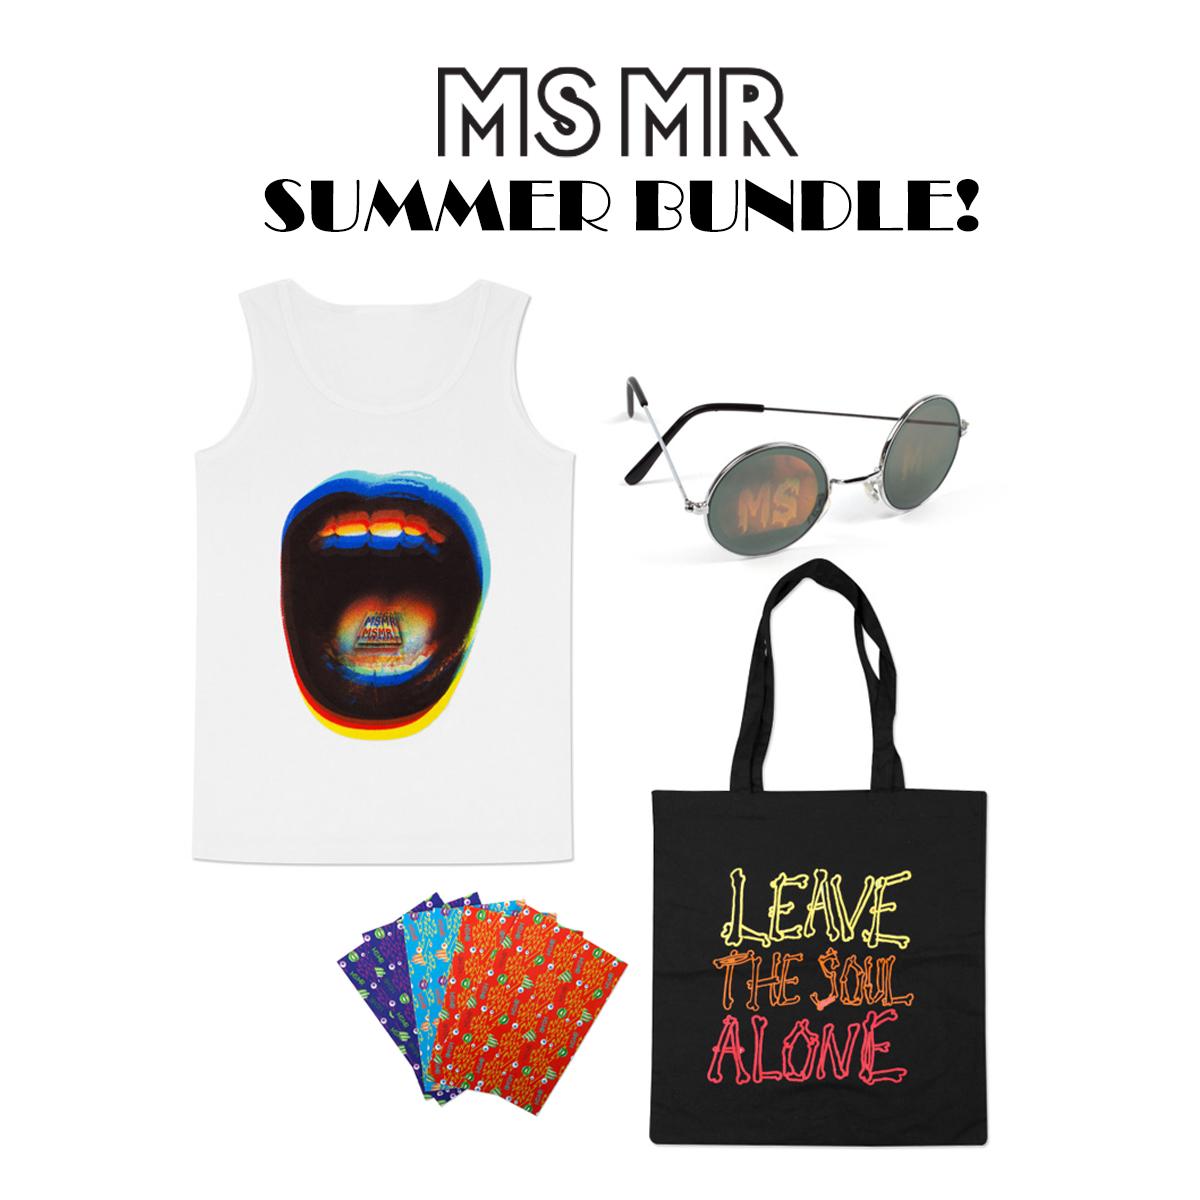 MSMR SUMMER BUNDLE